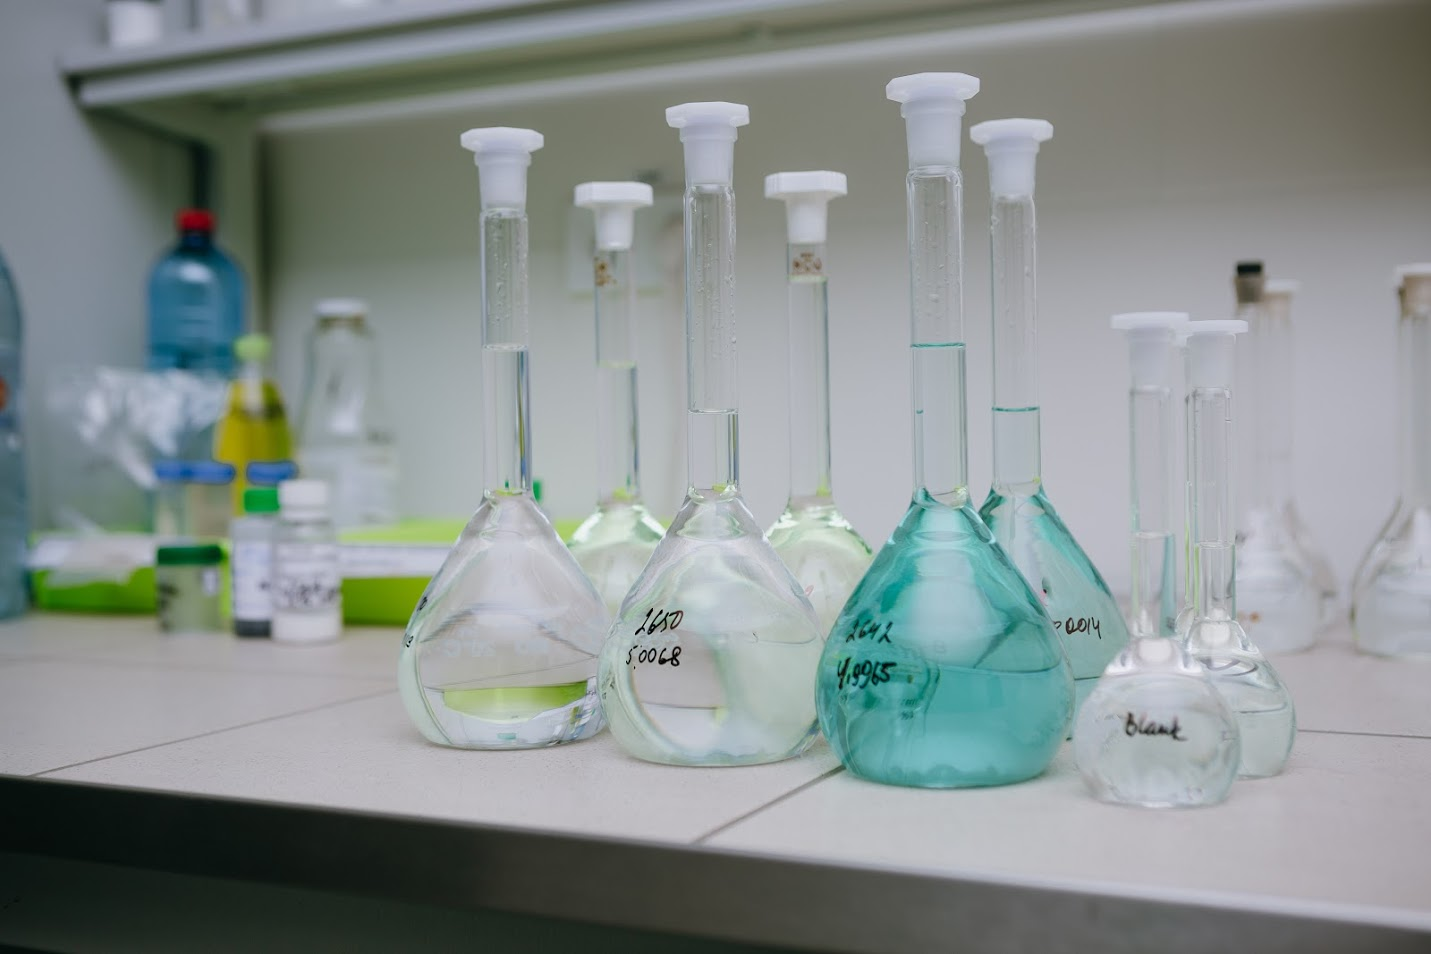 laboratory.jpg (108 KB)